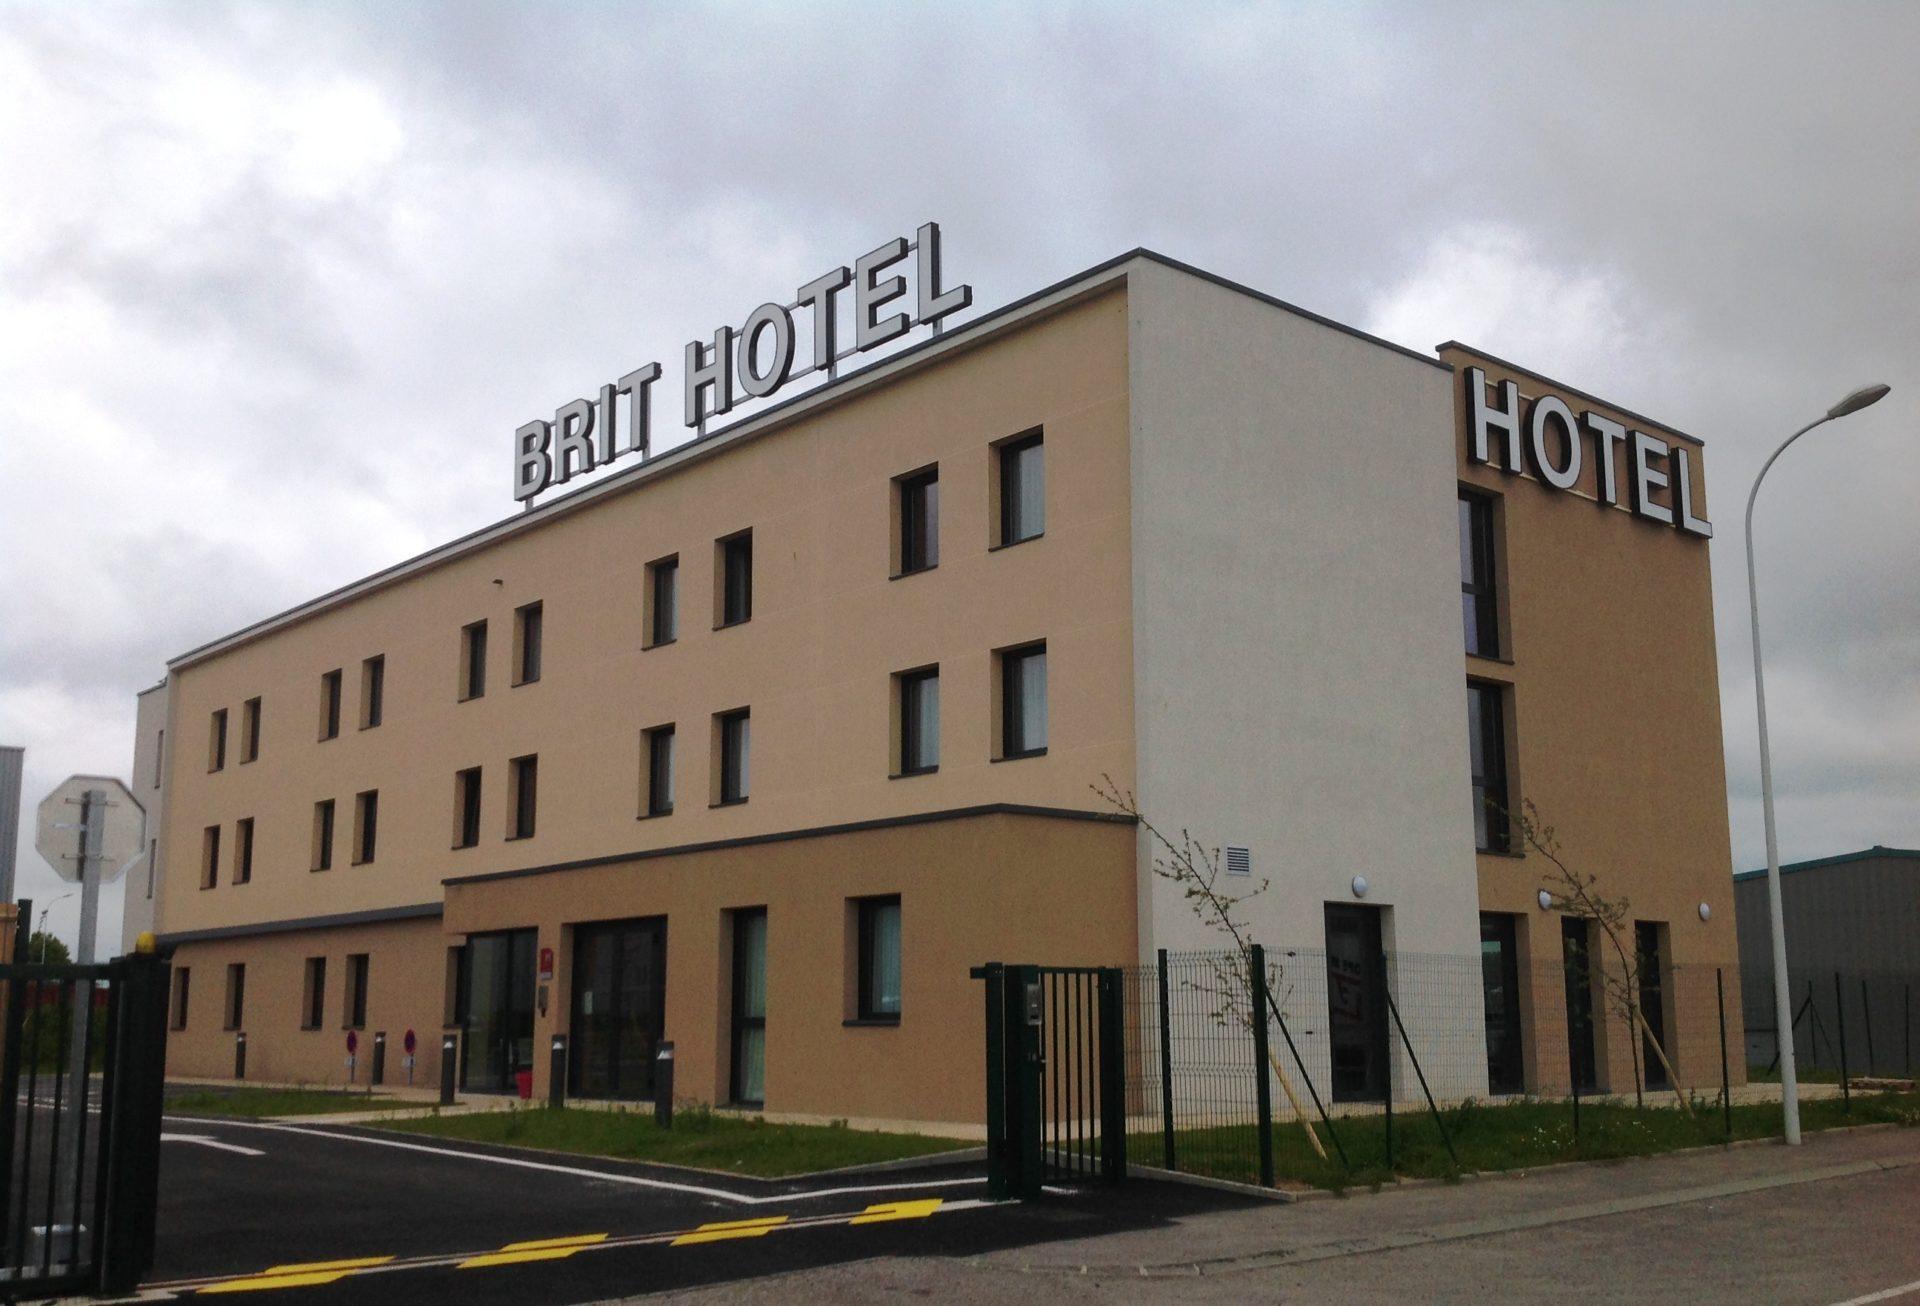 Brit Hotel à Dieppe (76)